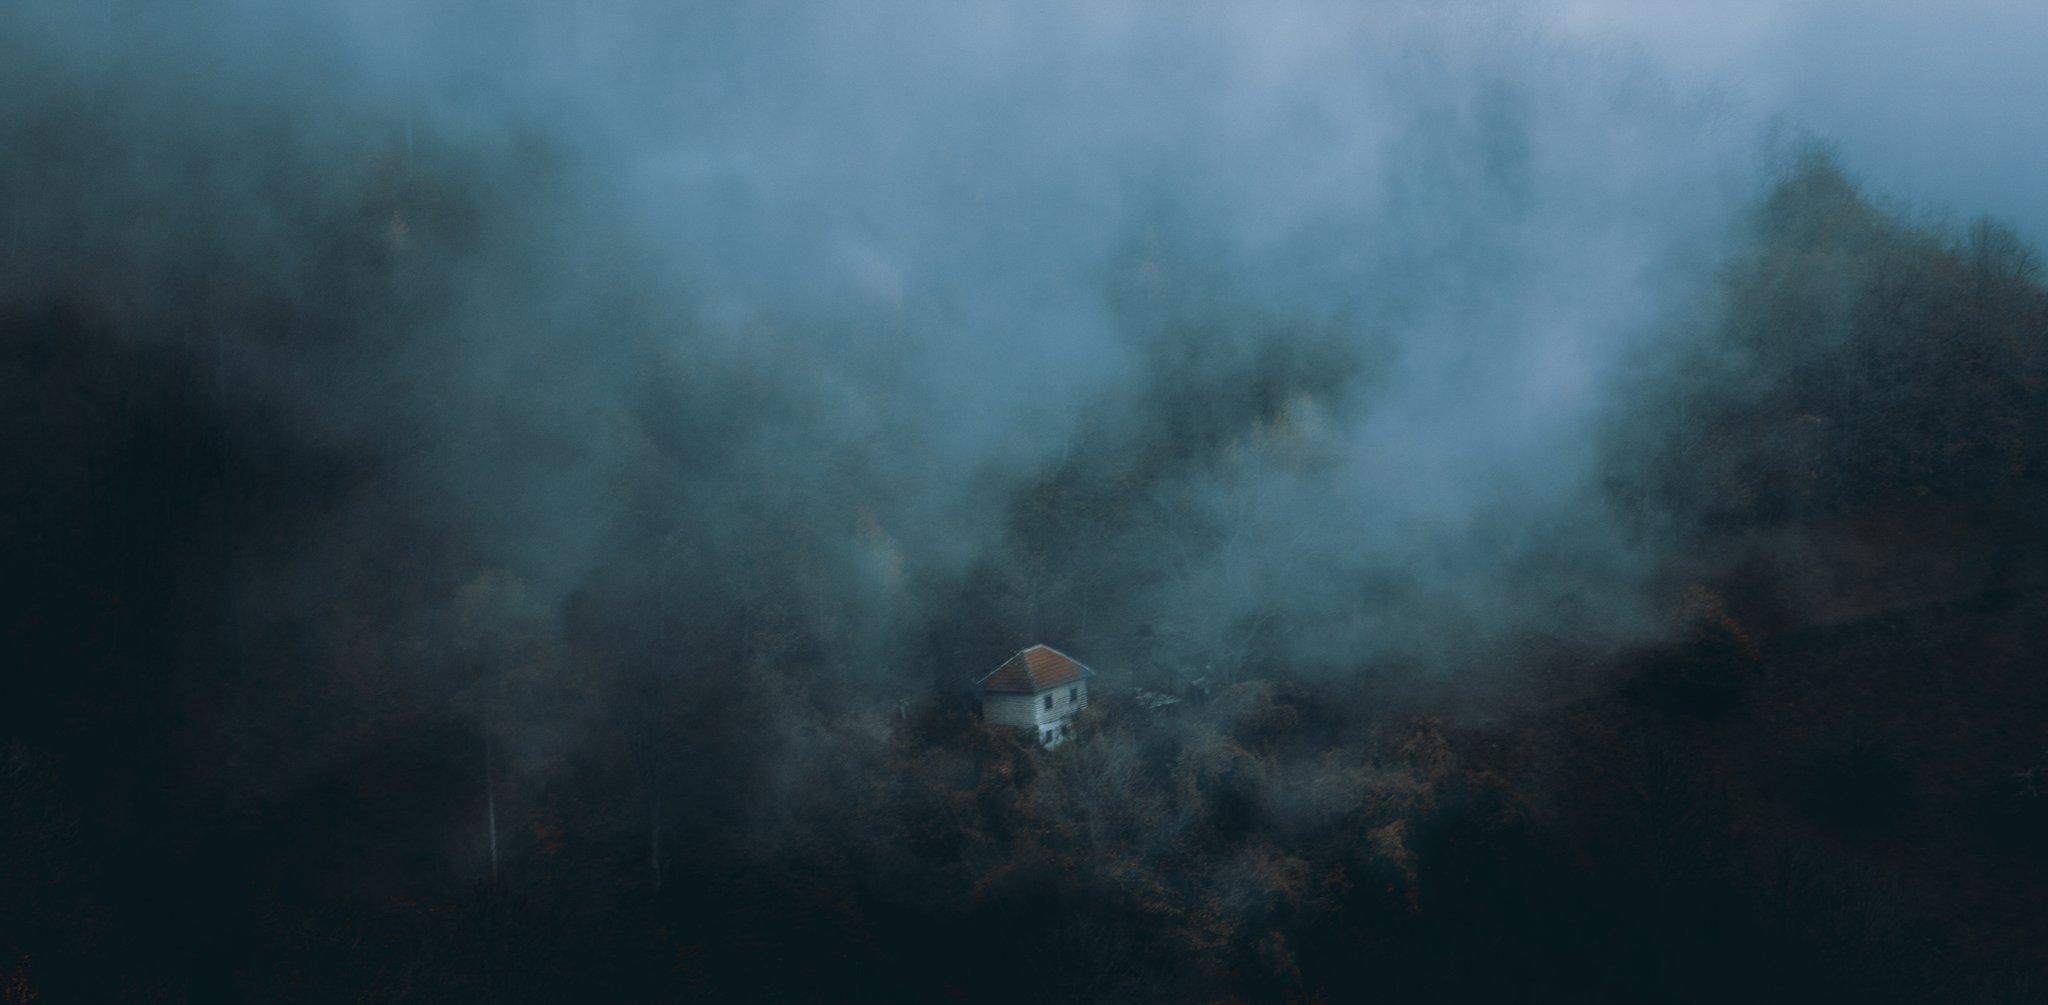 сербия, гора, туман, туман, лес, дом, один, изолированный, природа, забытый, старый, изобилующий,serbia, mountain, fog, misty, forest, house, alone, isolated, nature, forgotten, old, abounded,, Марко Радовановић